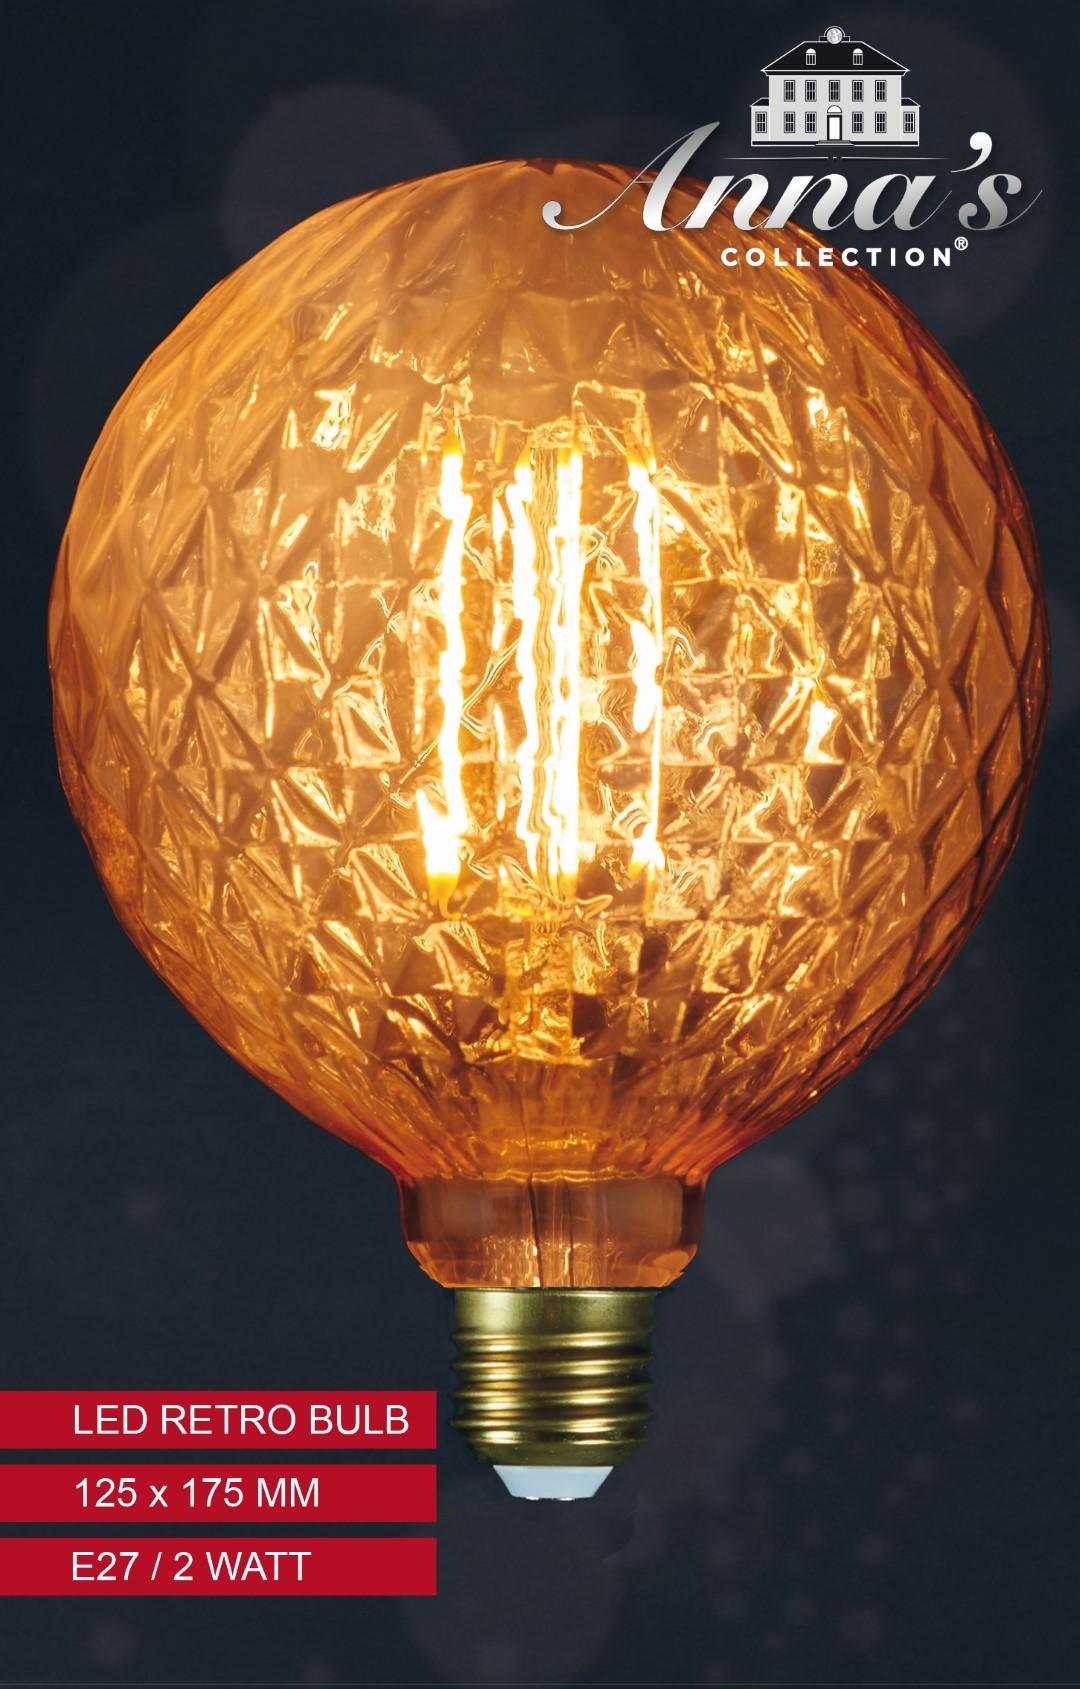 Led retro lamp kristal 125x175mm 2w/e27 Anna's collection